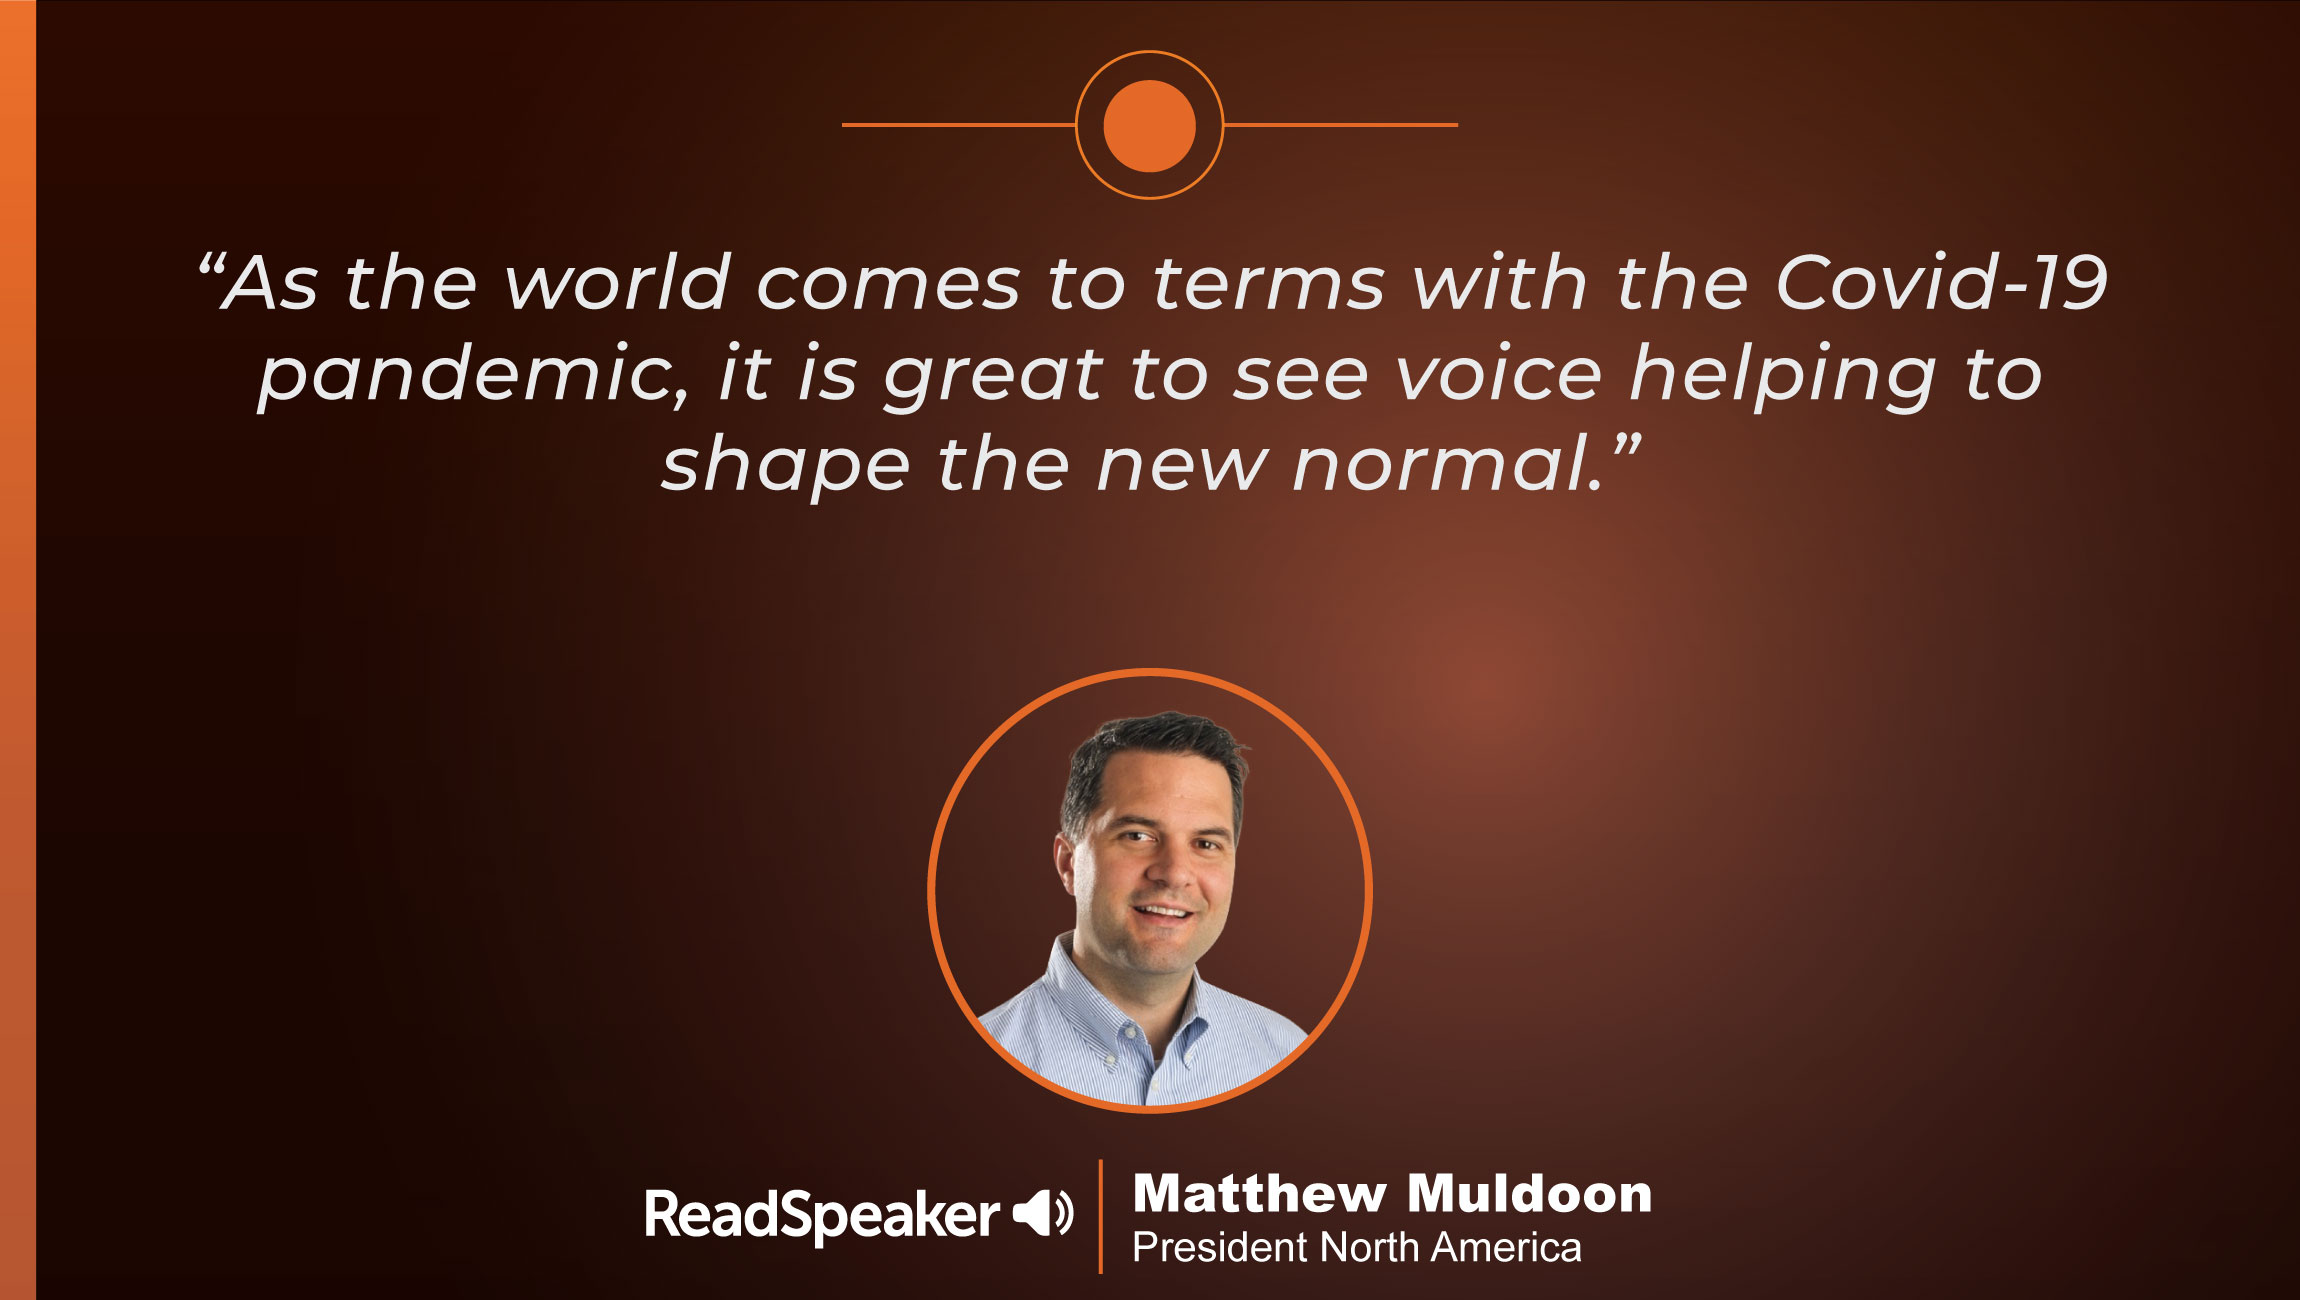 TechBytes with Matt Muldoon, President North America at ReadSpeaker